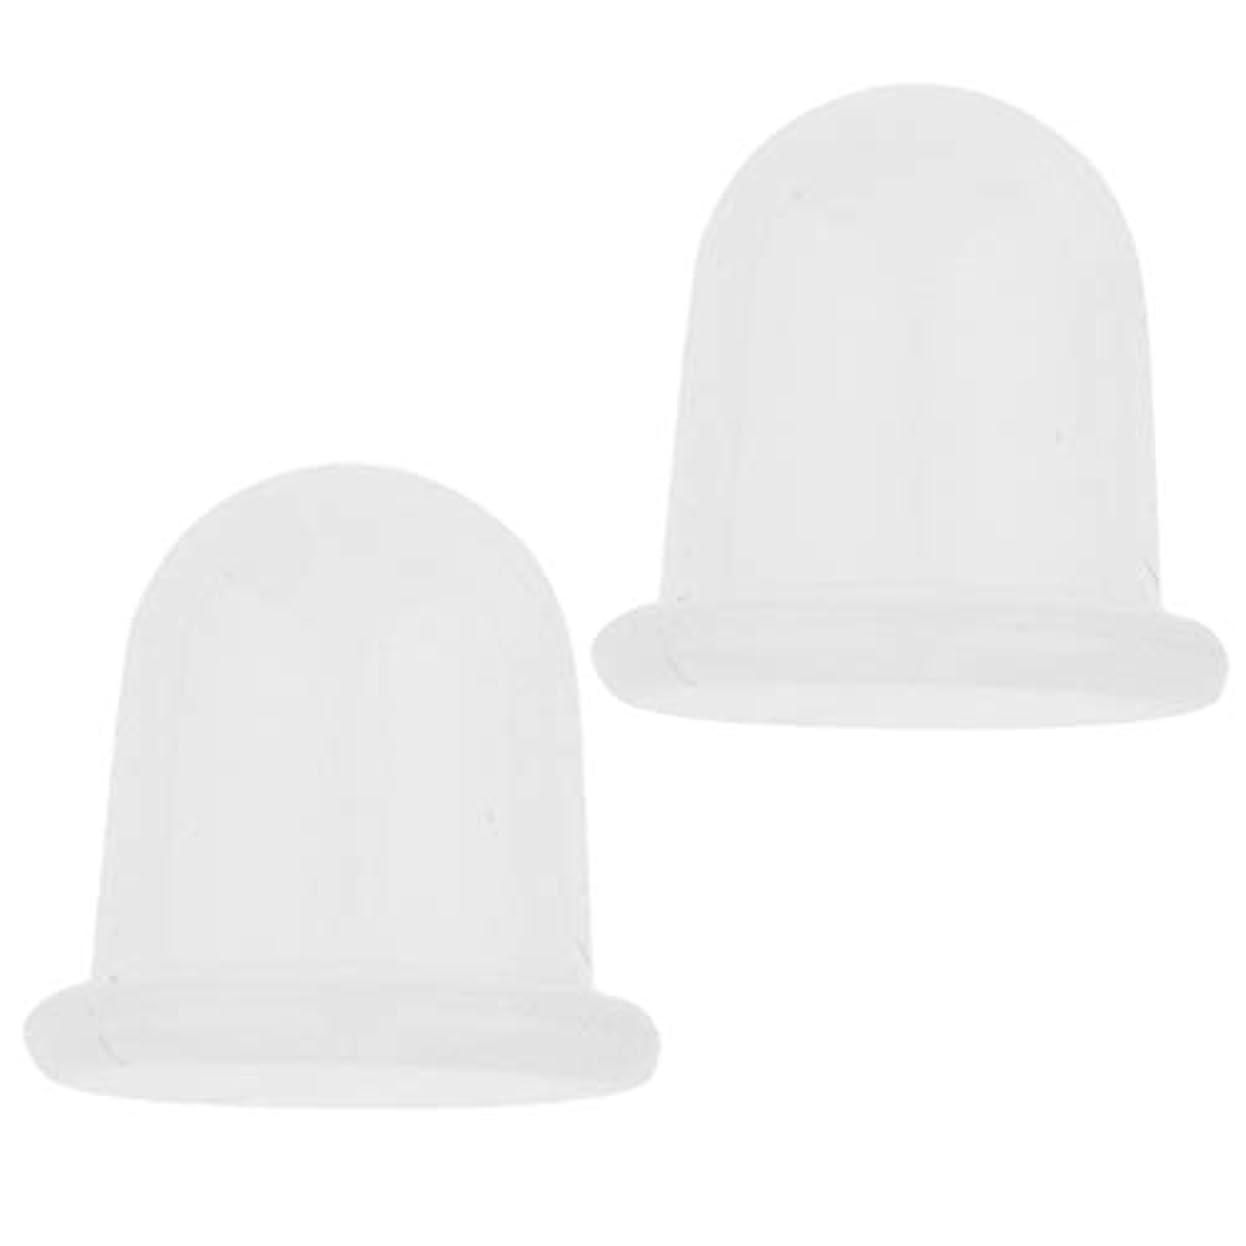 FLAMEER 真空カッピングカップ 吸玉 顔 目 頚部 背中 胸 脚 全身のメッセージ用 2ピース 汎用